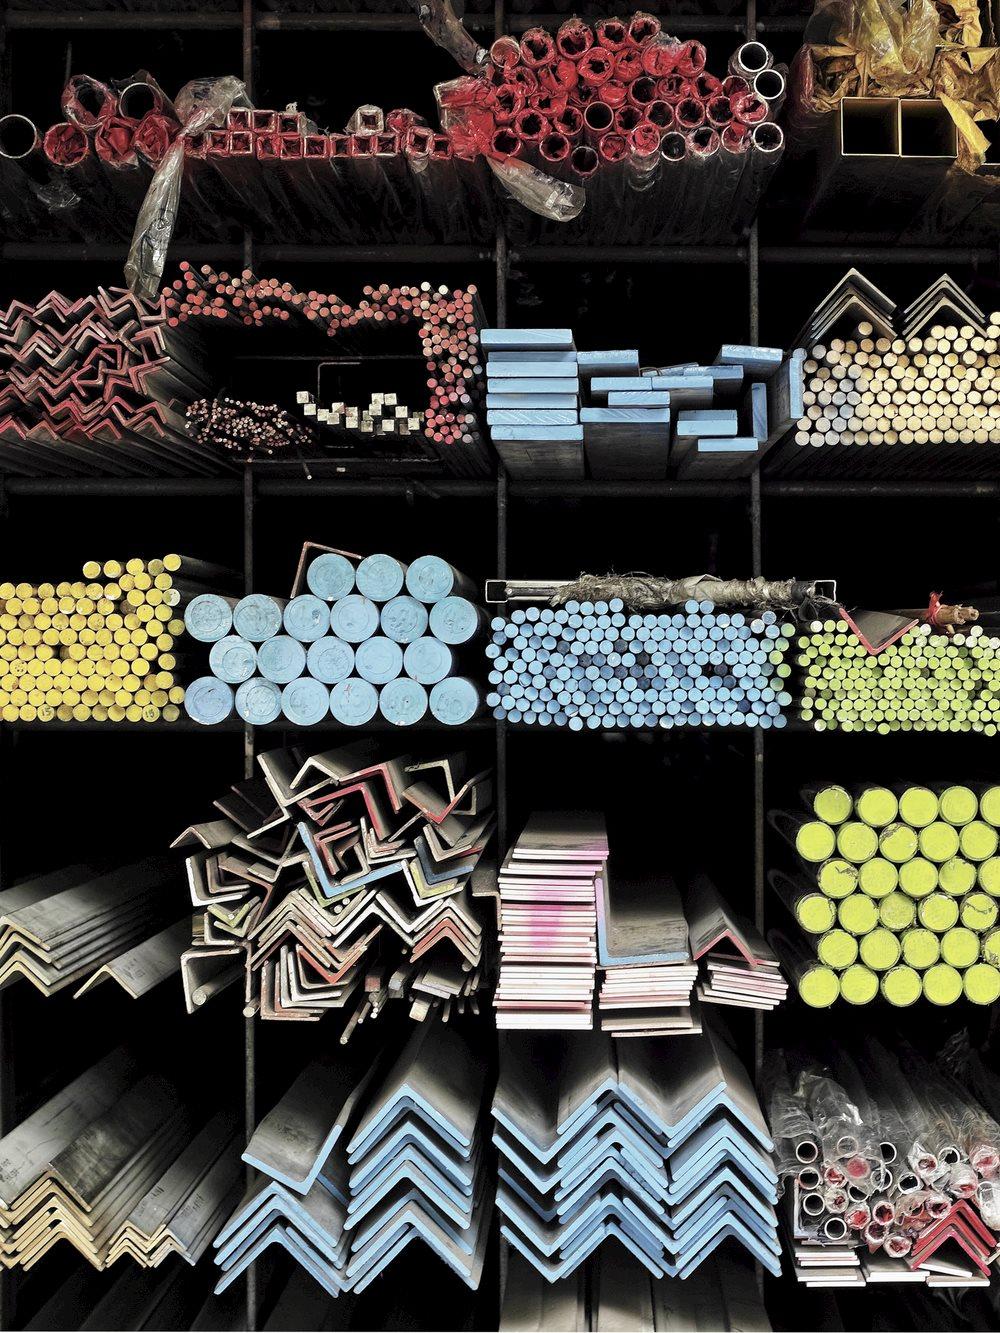 Workpiece_materials_Stock.jpg